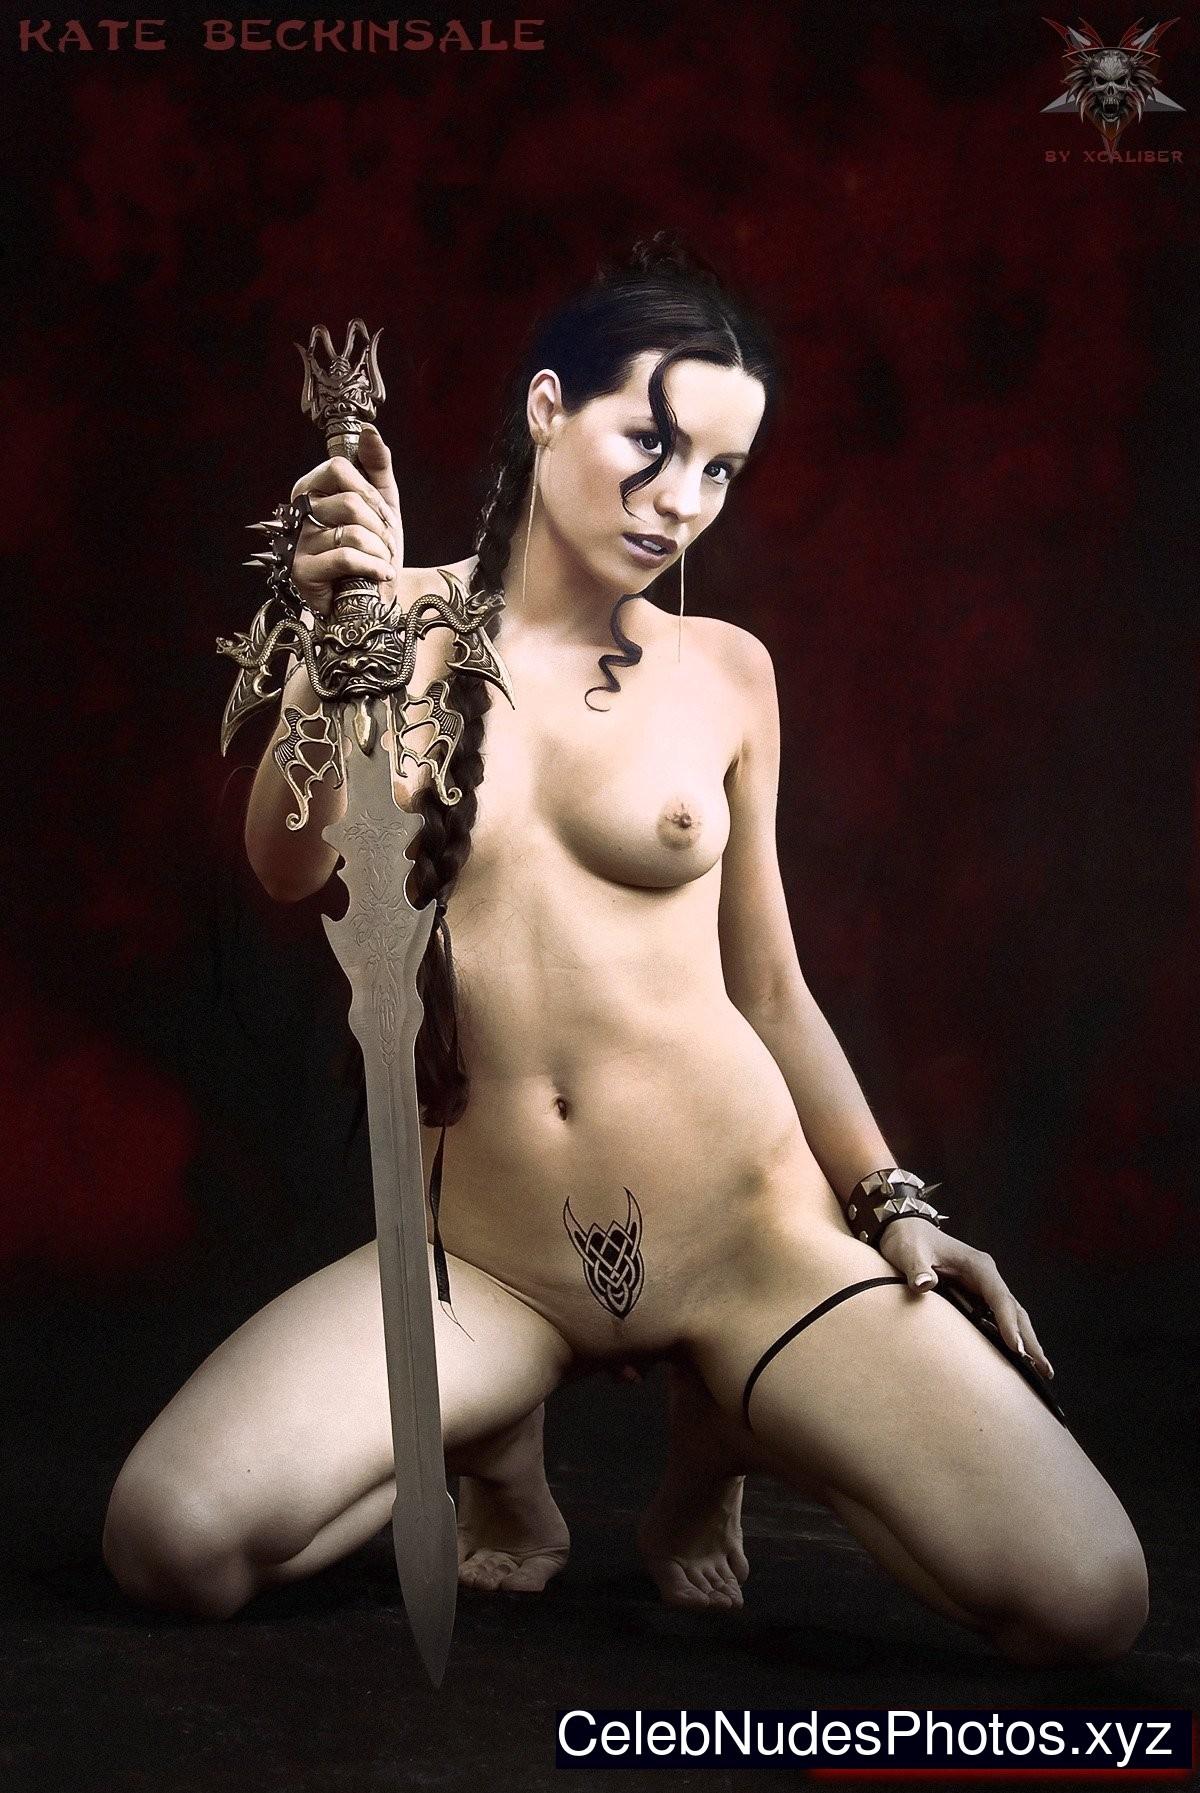 Kate beckinsale free nude pics